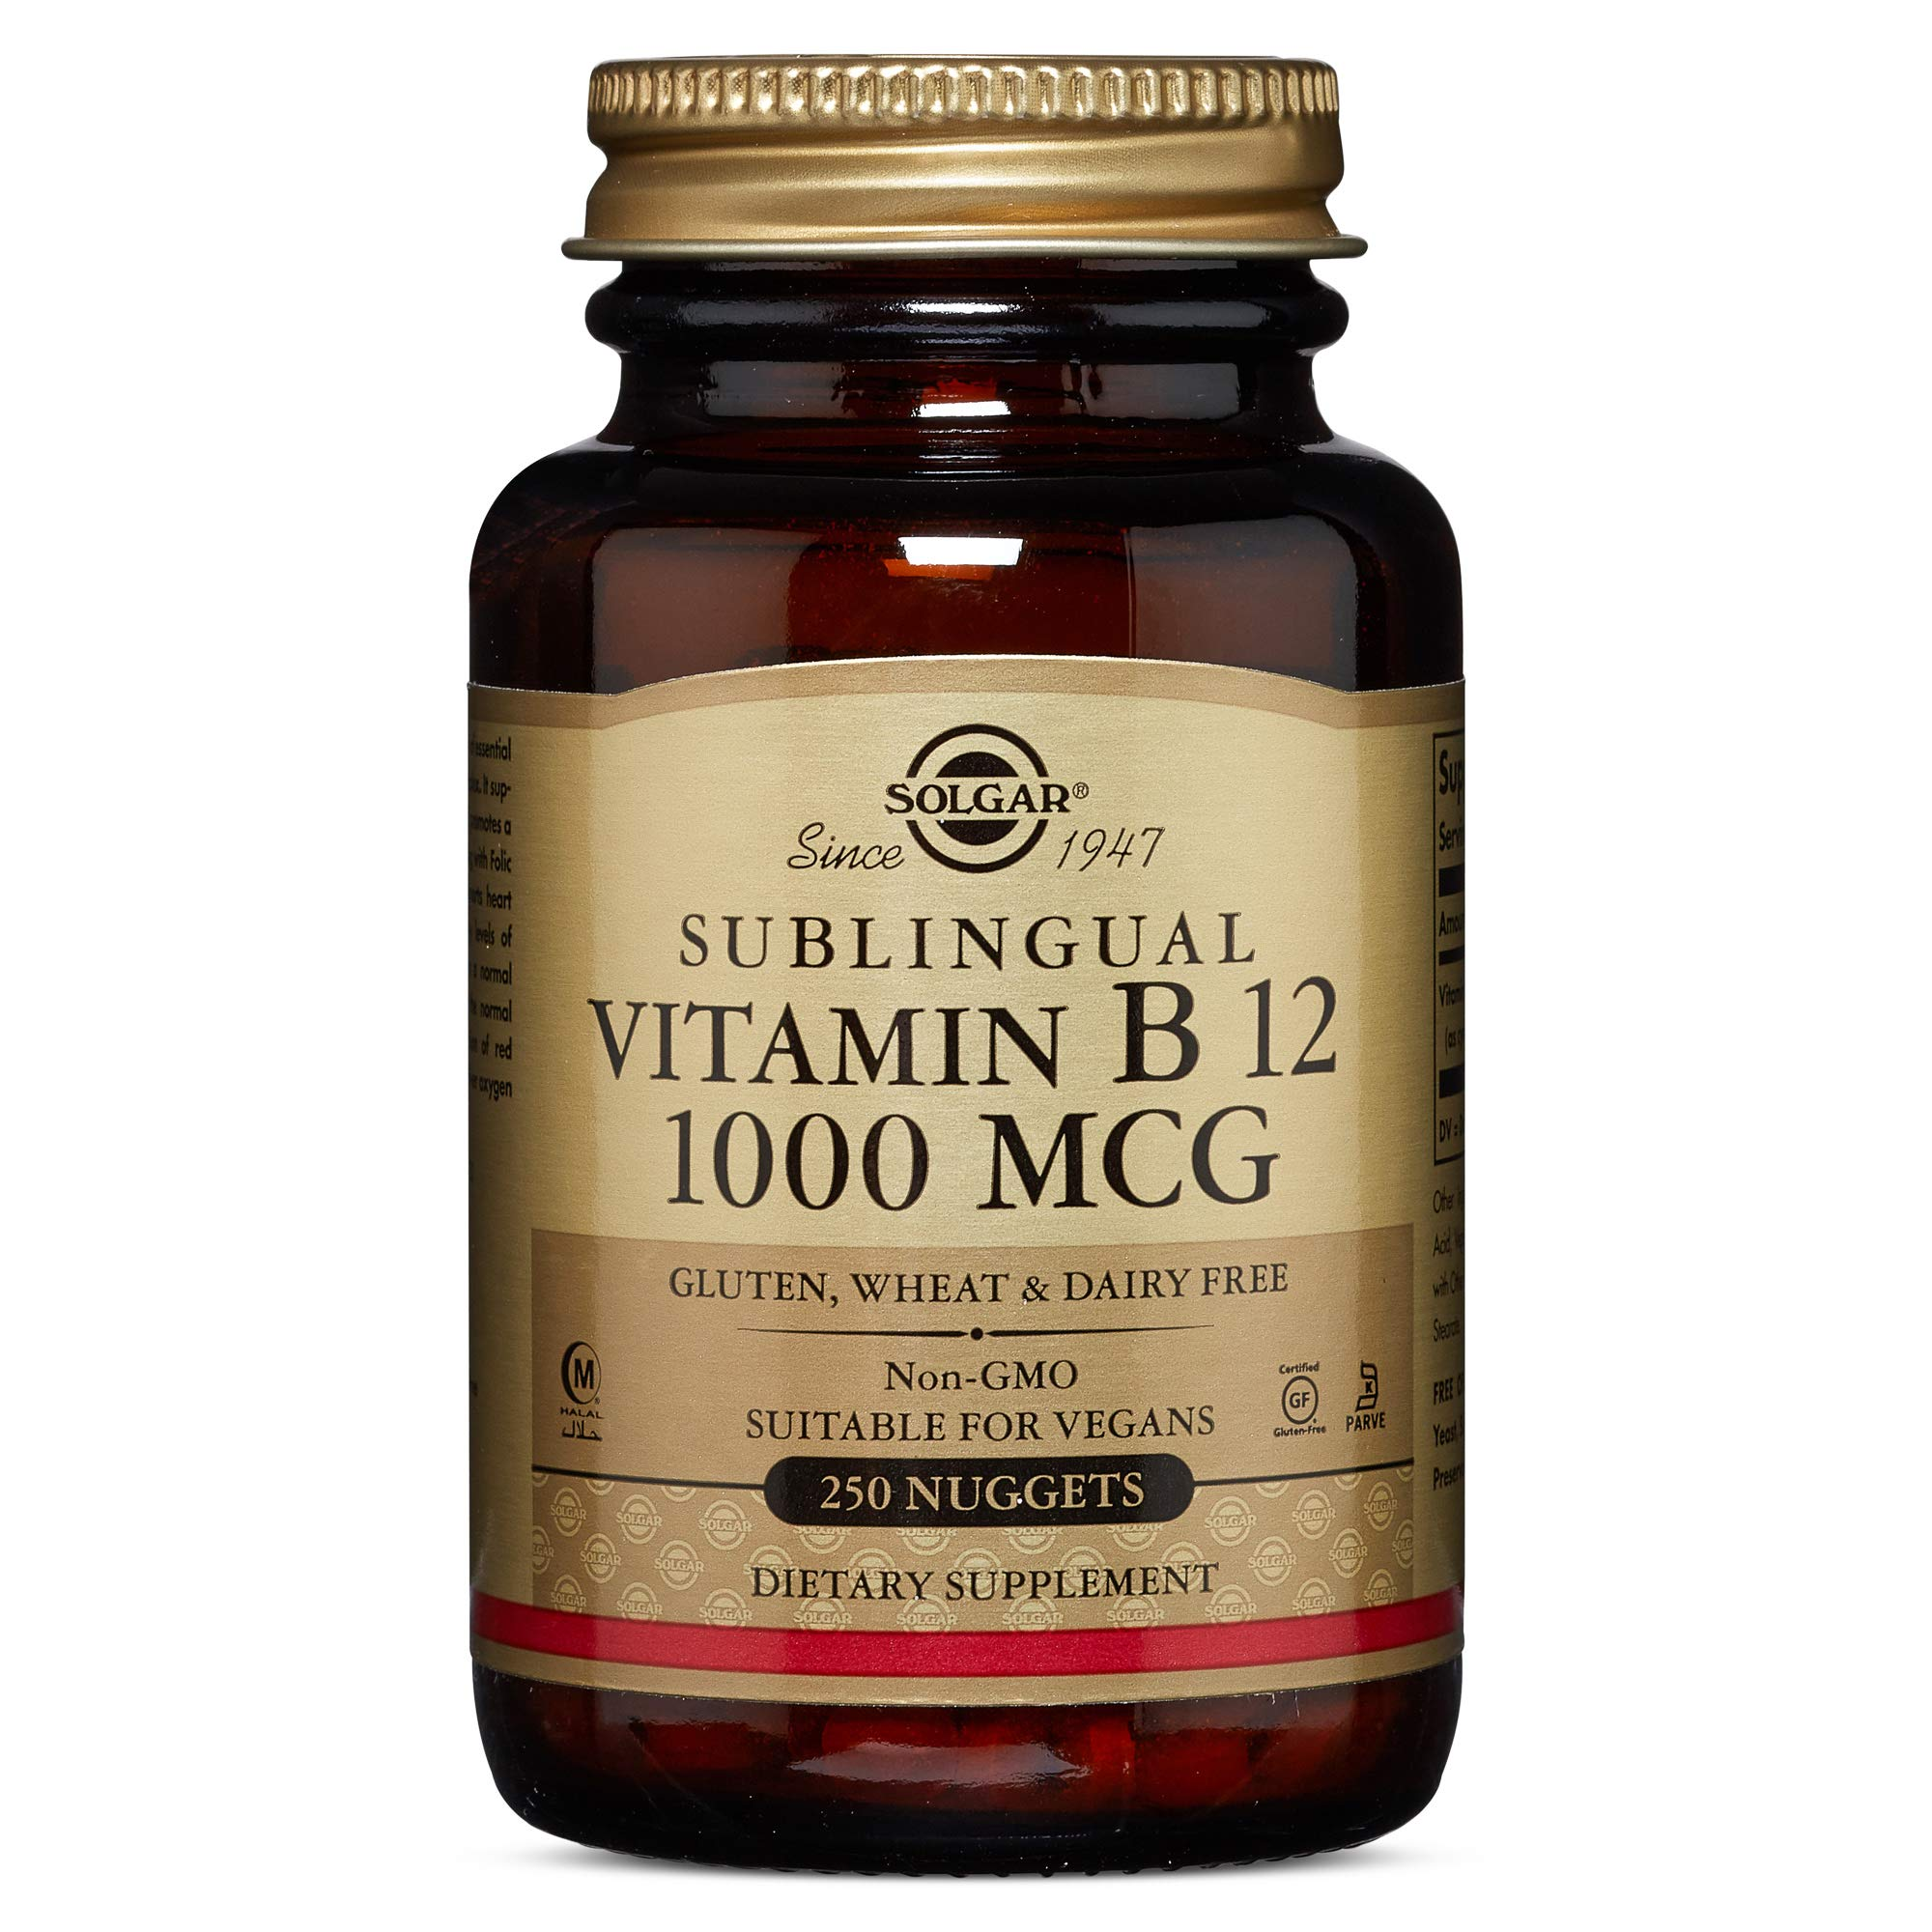 Solgar - Vitamin B12, 1000 mcg, 250 Nuggets by Solgar